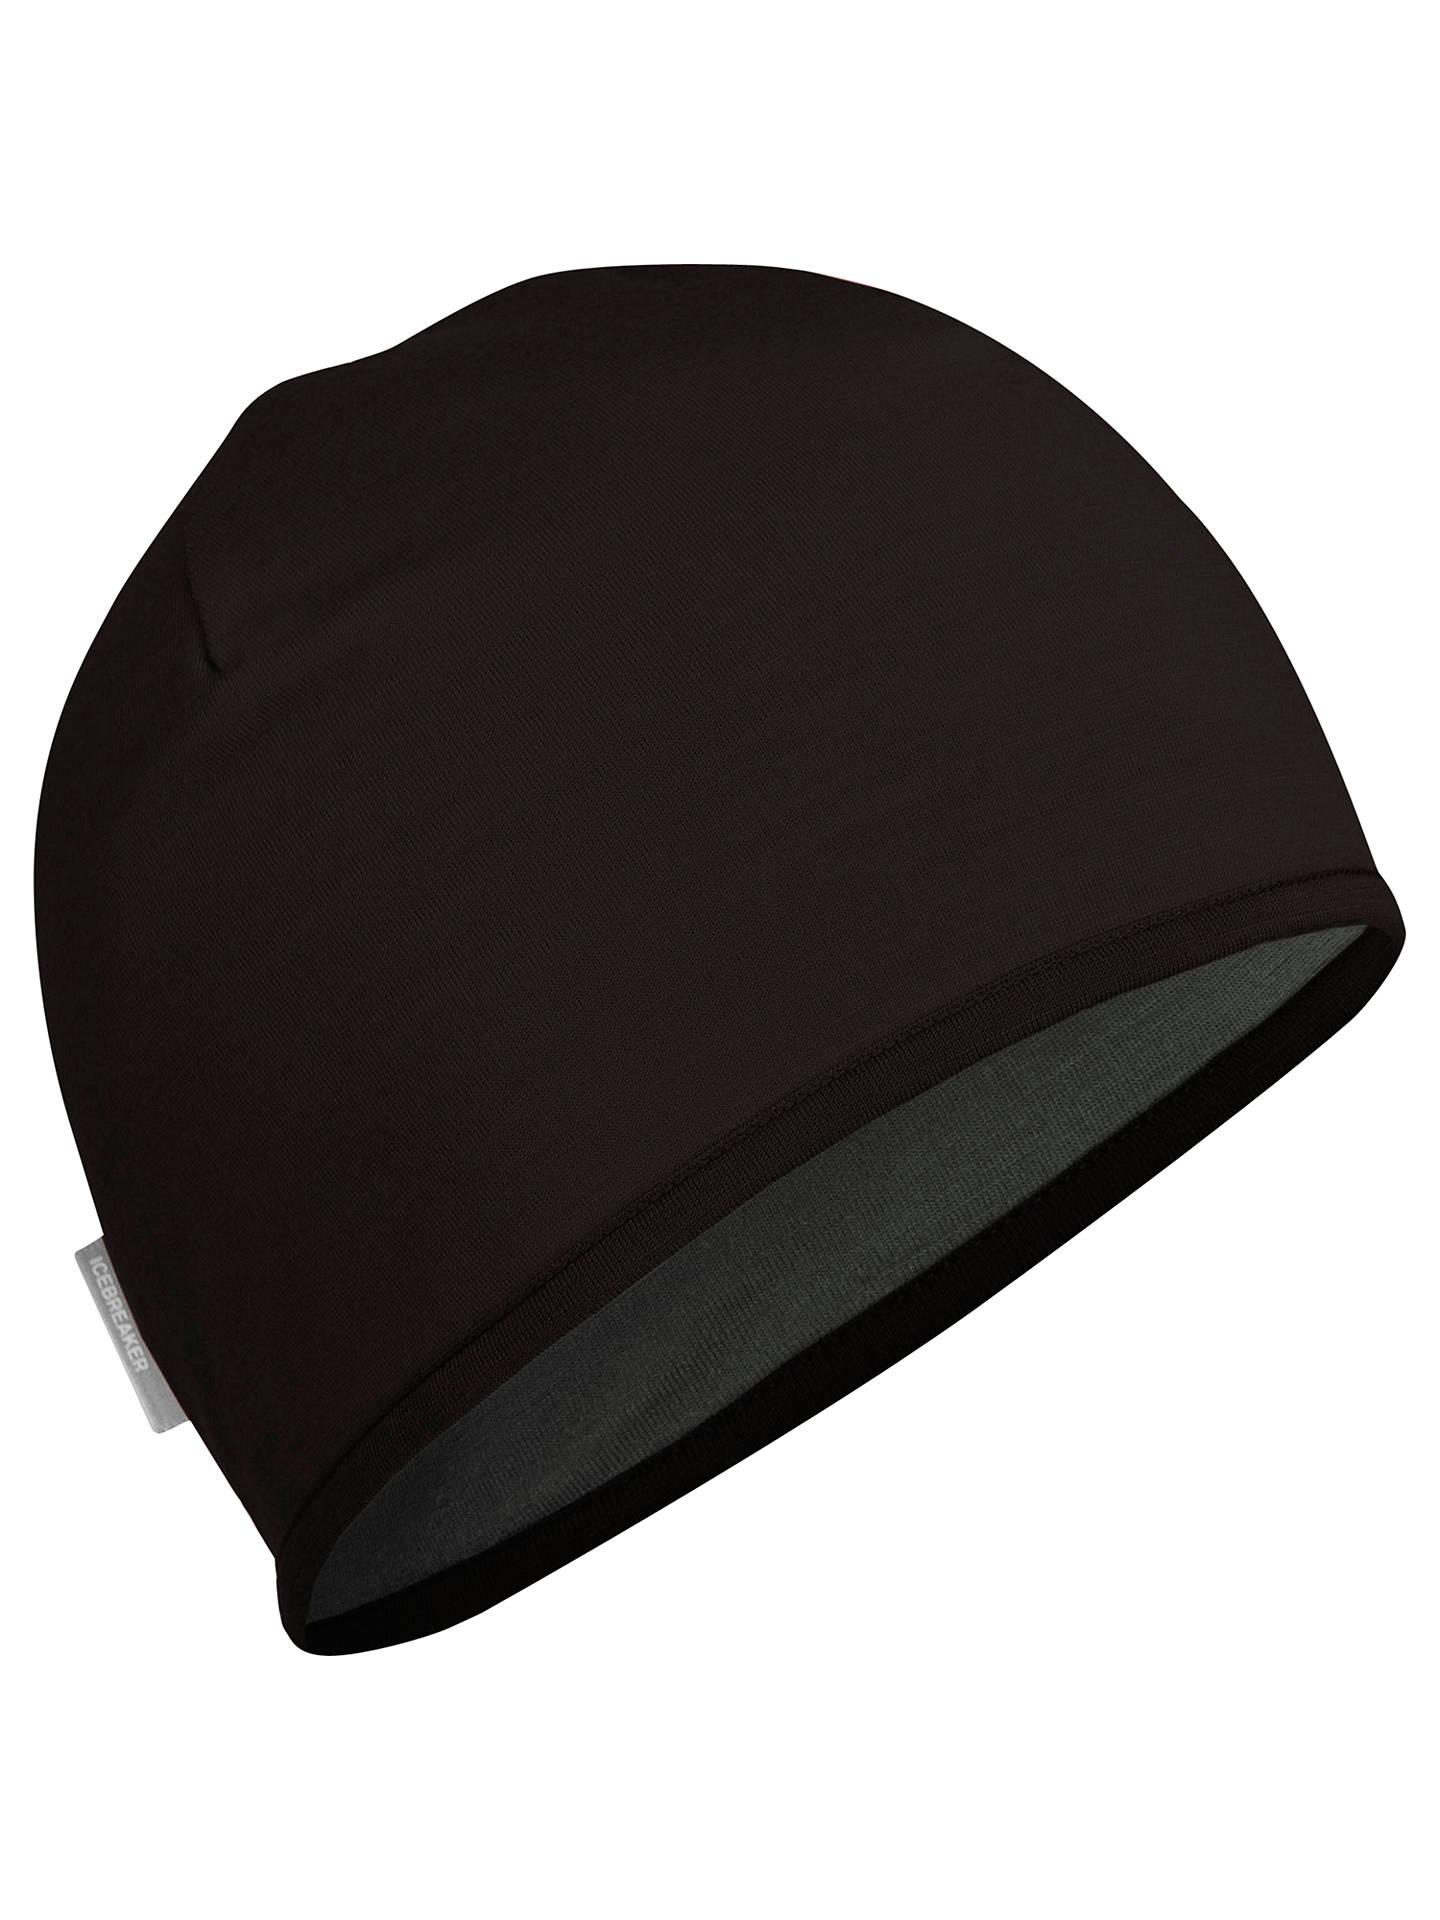 998ca4b2795 Buy Icebreaker Pocket 200 Beanie Hat